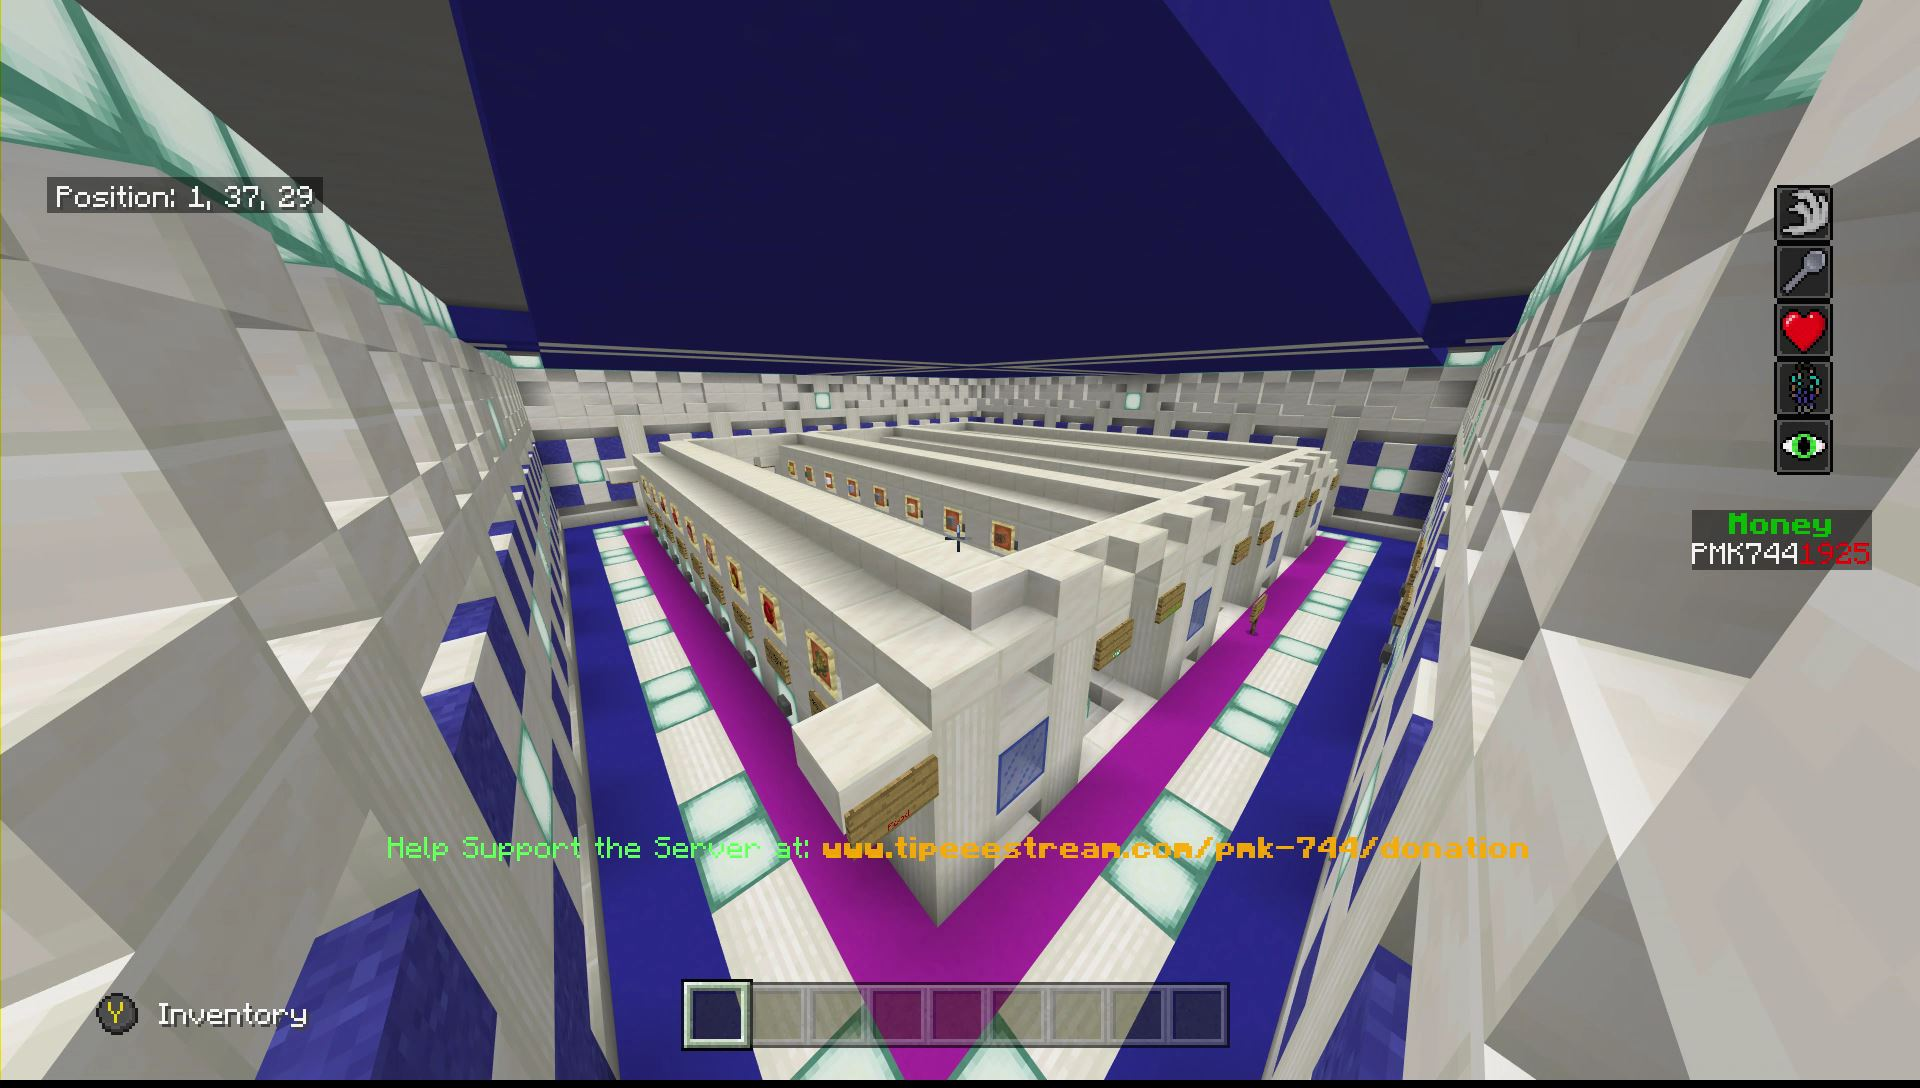 Minecraft Serenity Factions Realm [PvP] [Ranks] [Money] (Bedrock